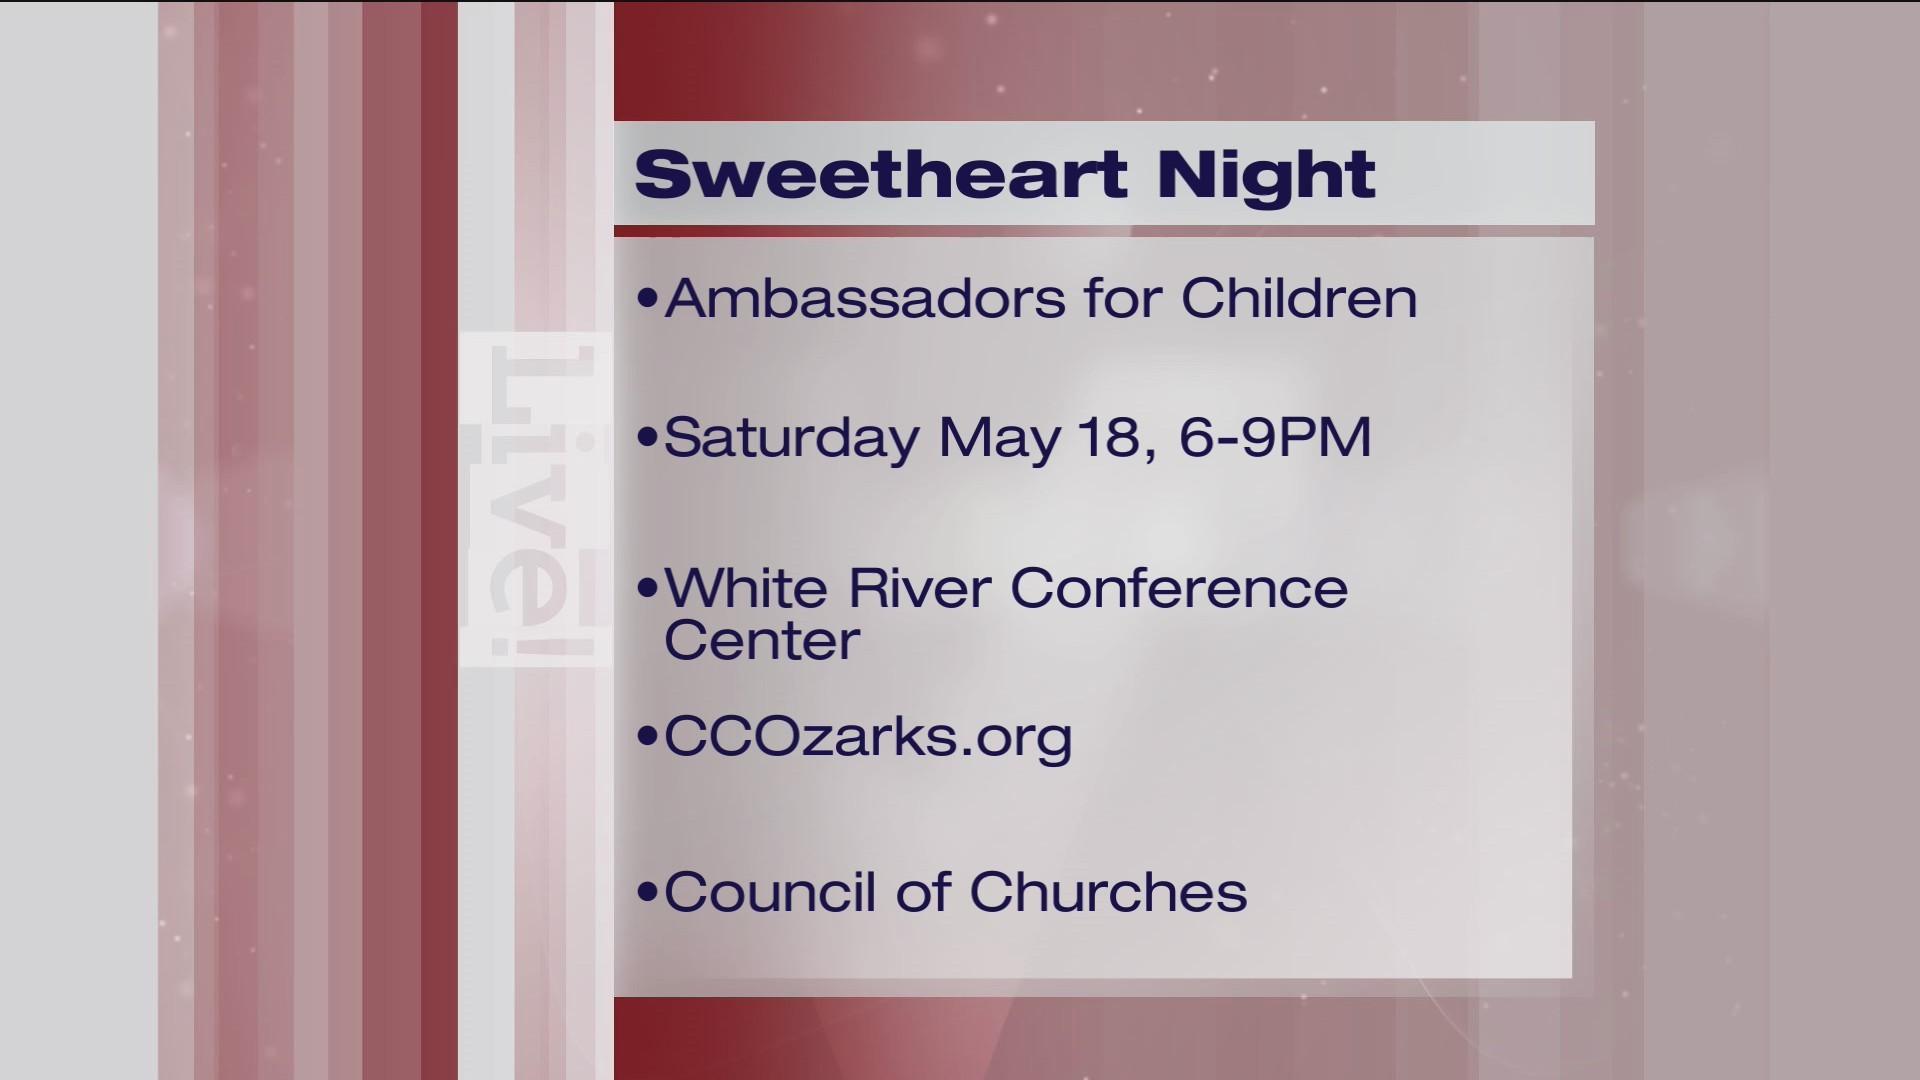 Ambassadors for Children - Council of Churches - 4/24/19